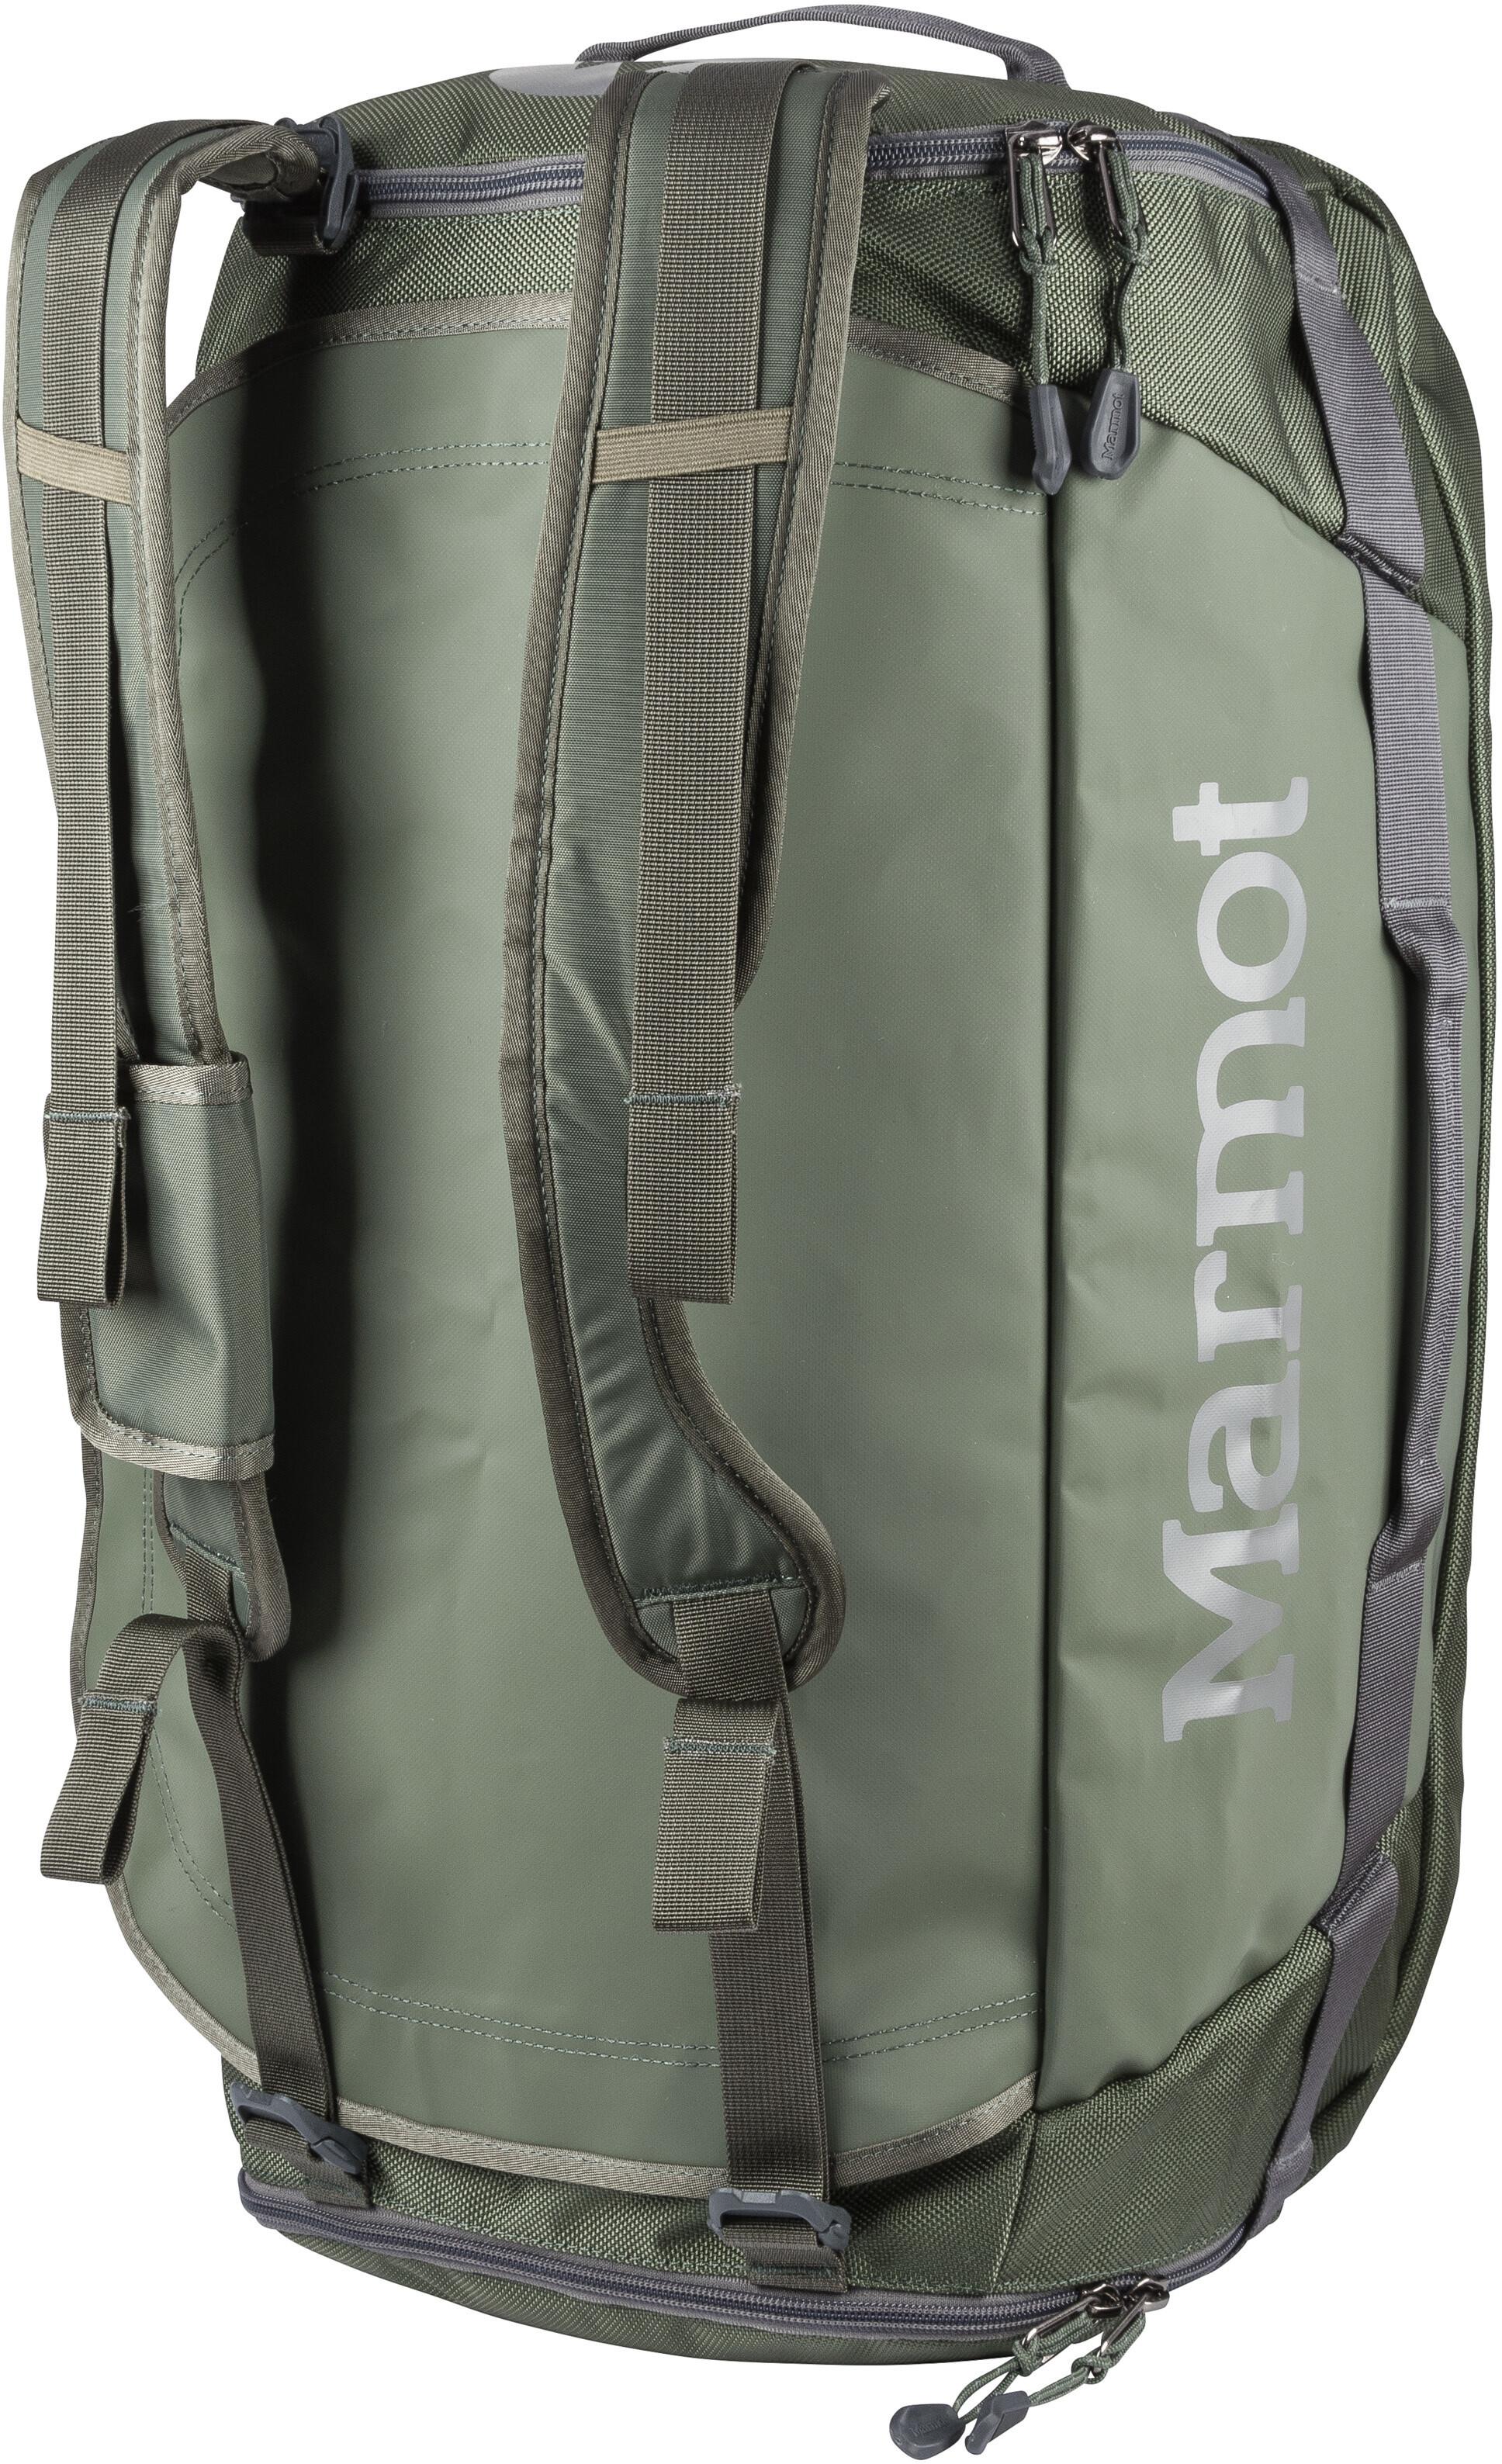 14a072678 Marmot Long Hauler Duffel Travel Luggage Medium green at Addnature.co.uk